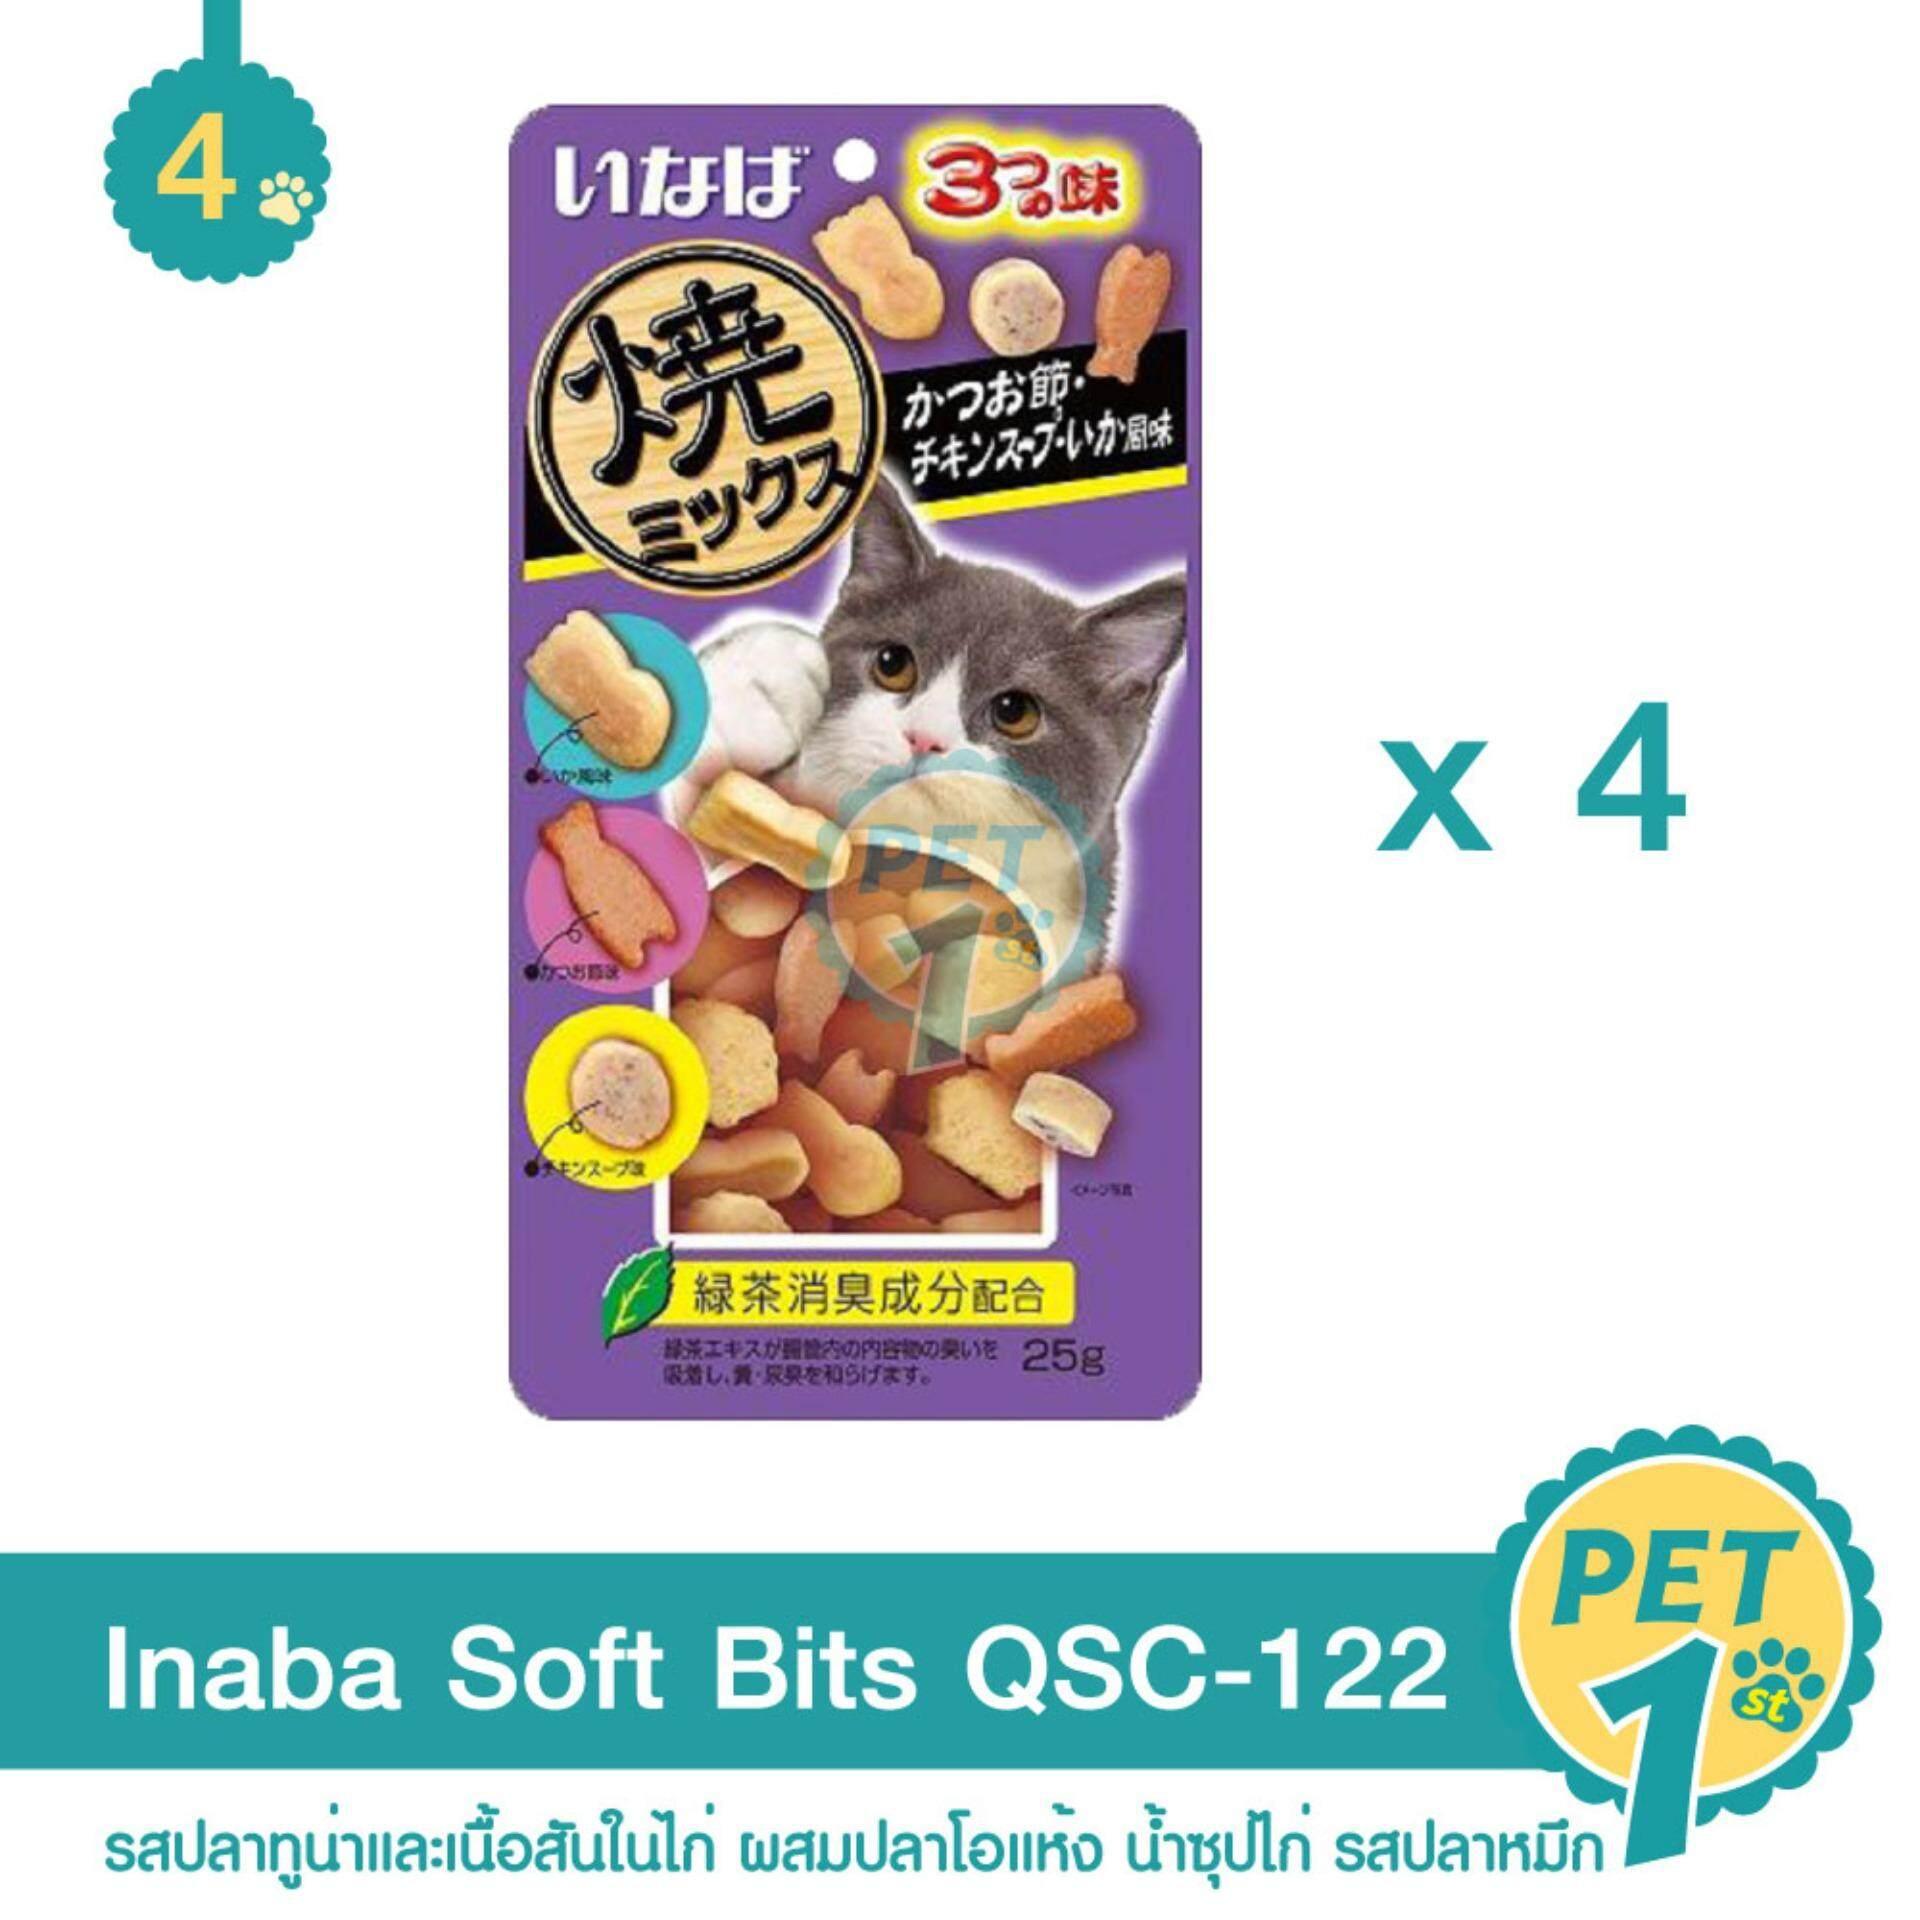 Inaba ขนมแมว Soft Bits รสปลาทูน่าและเนื้อสันในไก่ ผสมปลาโอแห้ง น้ำซุปไก่ รสปลาหมึก 25 กรัม/ซอง - 4 ซอง By Pet First.